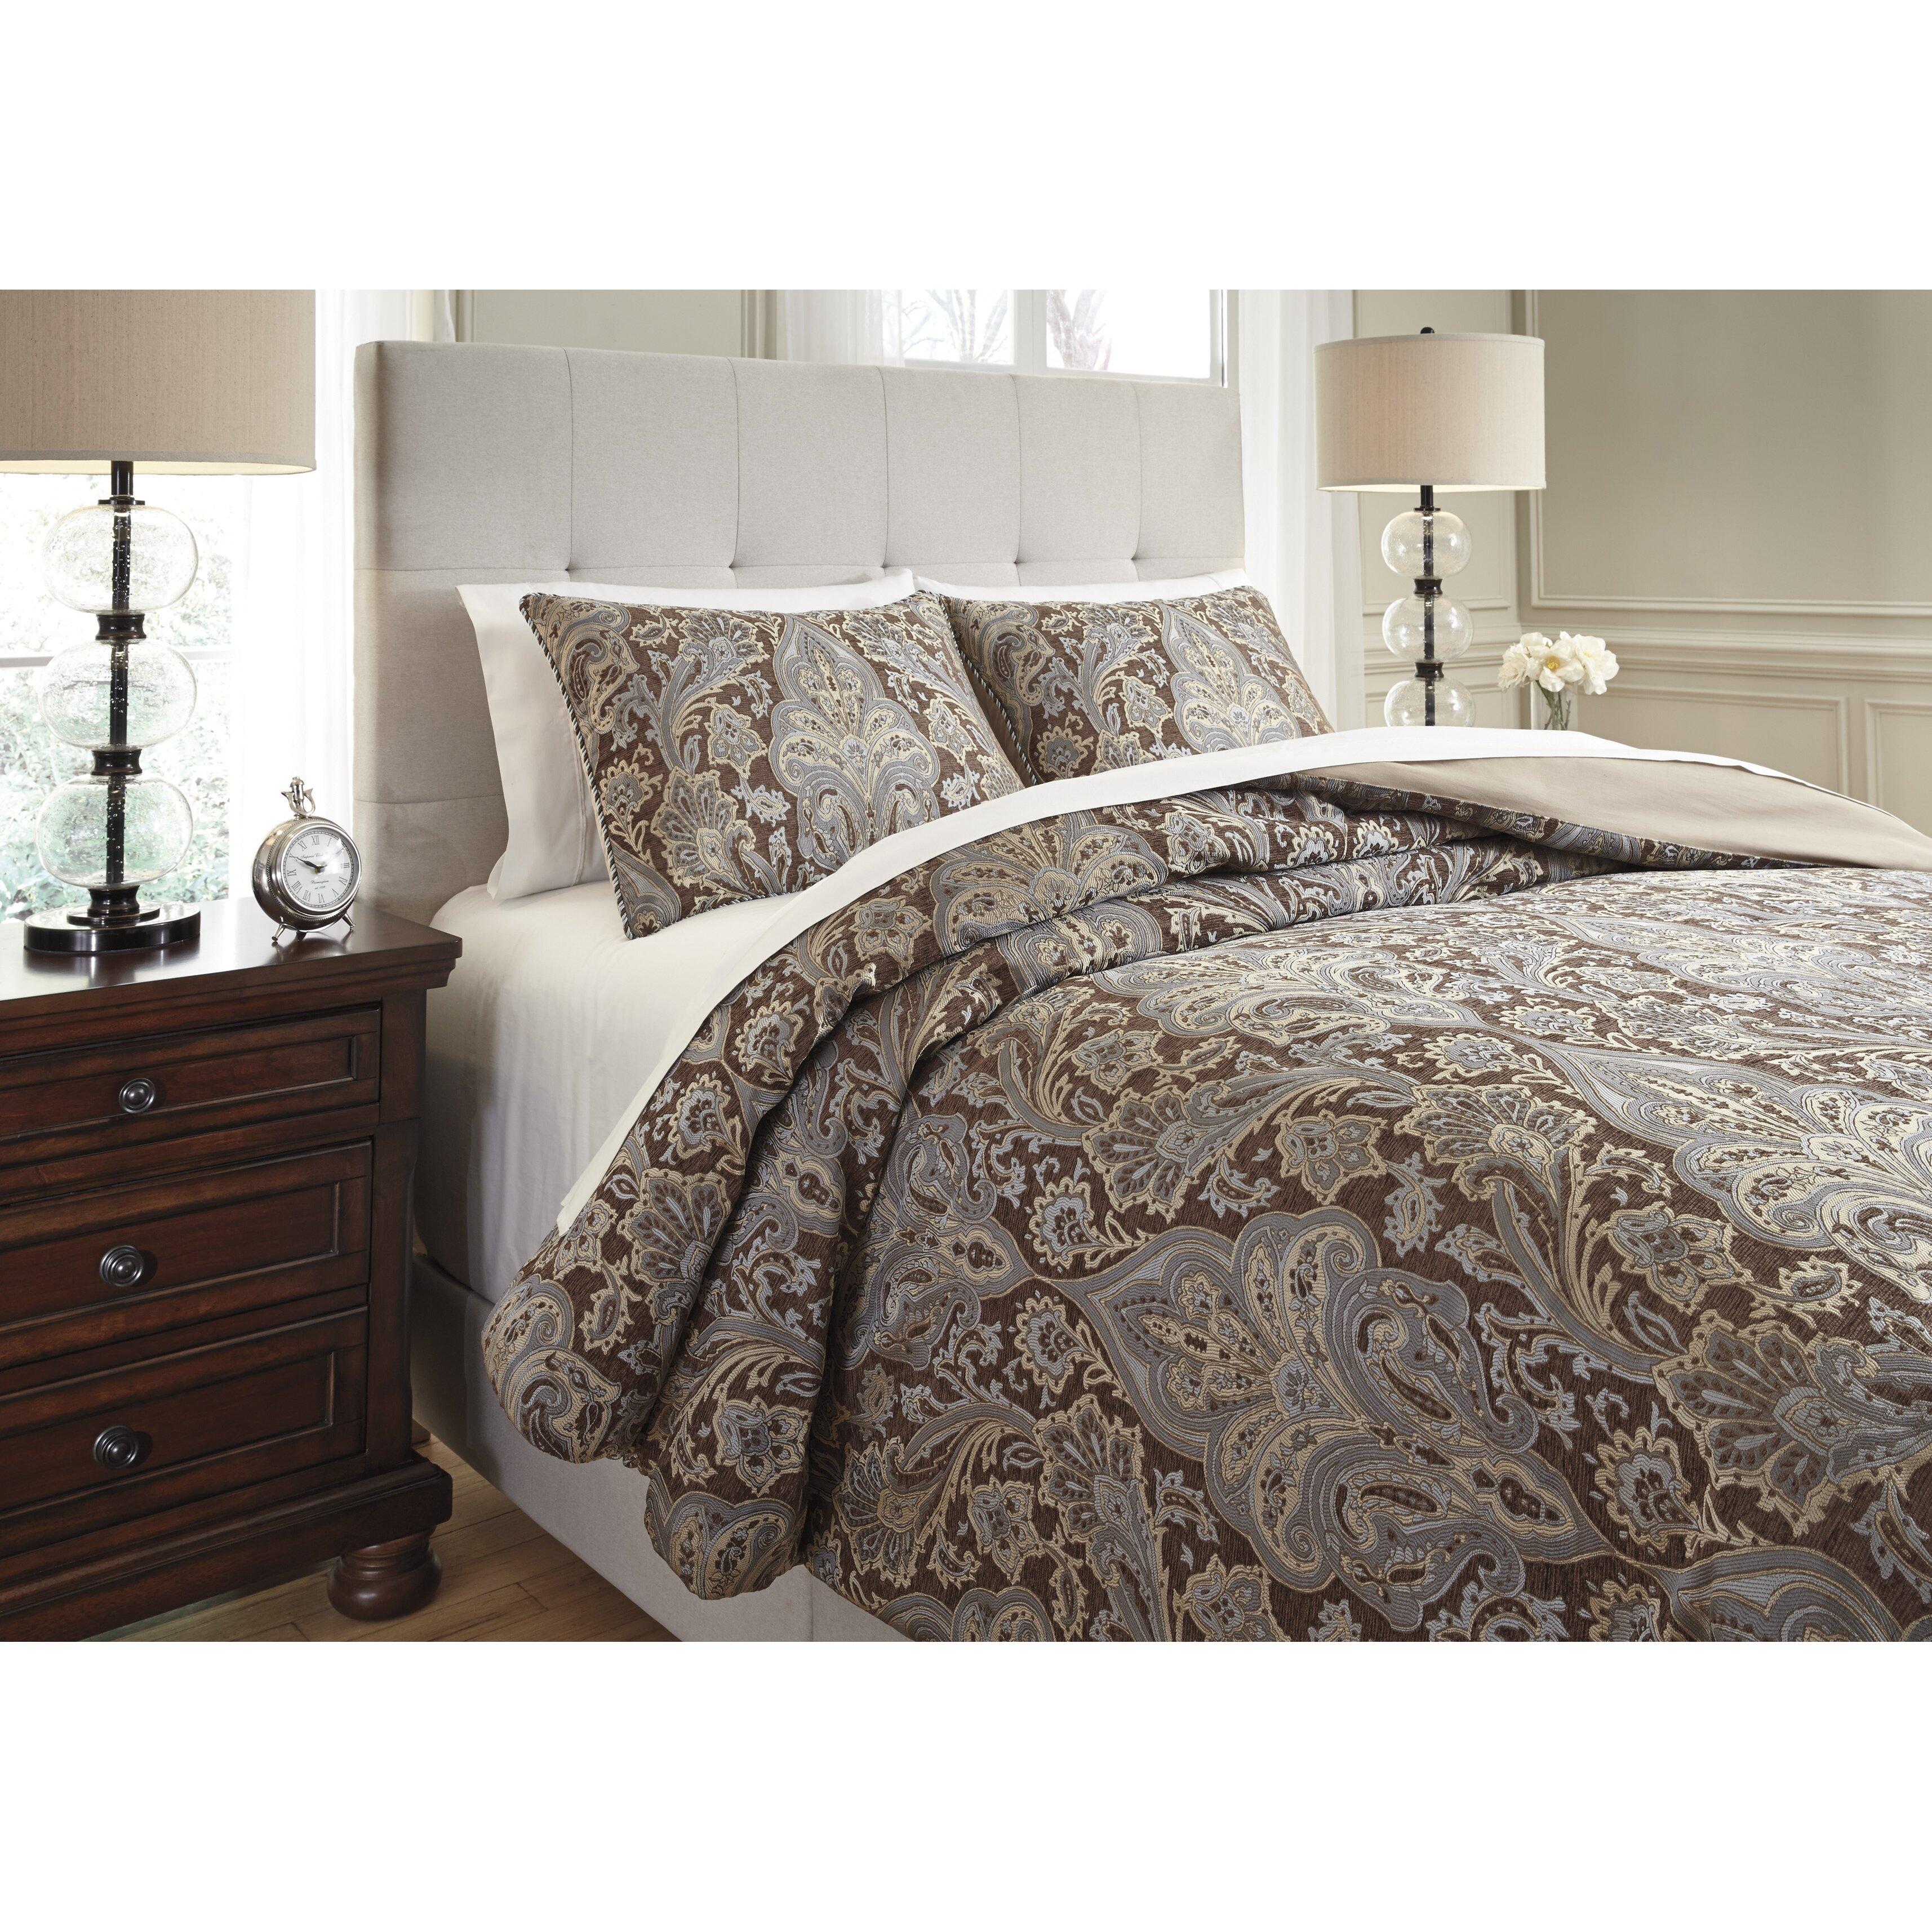 Astoria Grand Mullaghboy 3 Piece Reversible Comforter Set